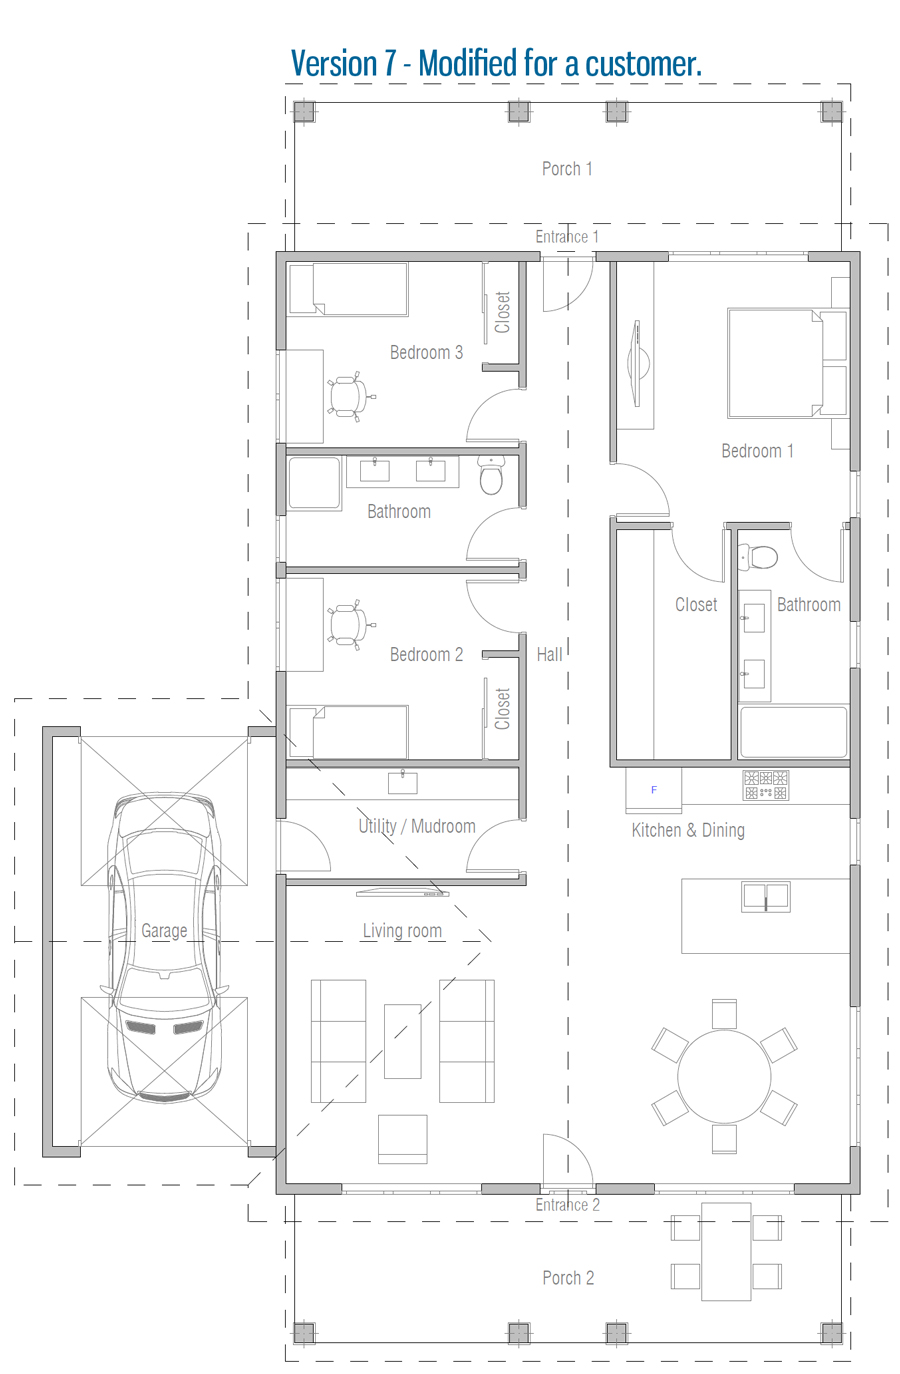 house-plans-2021_40_HOUSE_PLAN_CH671_V7.jpg